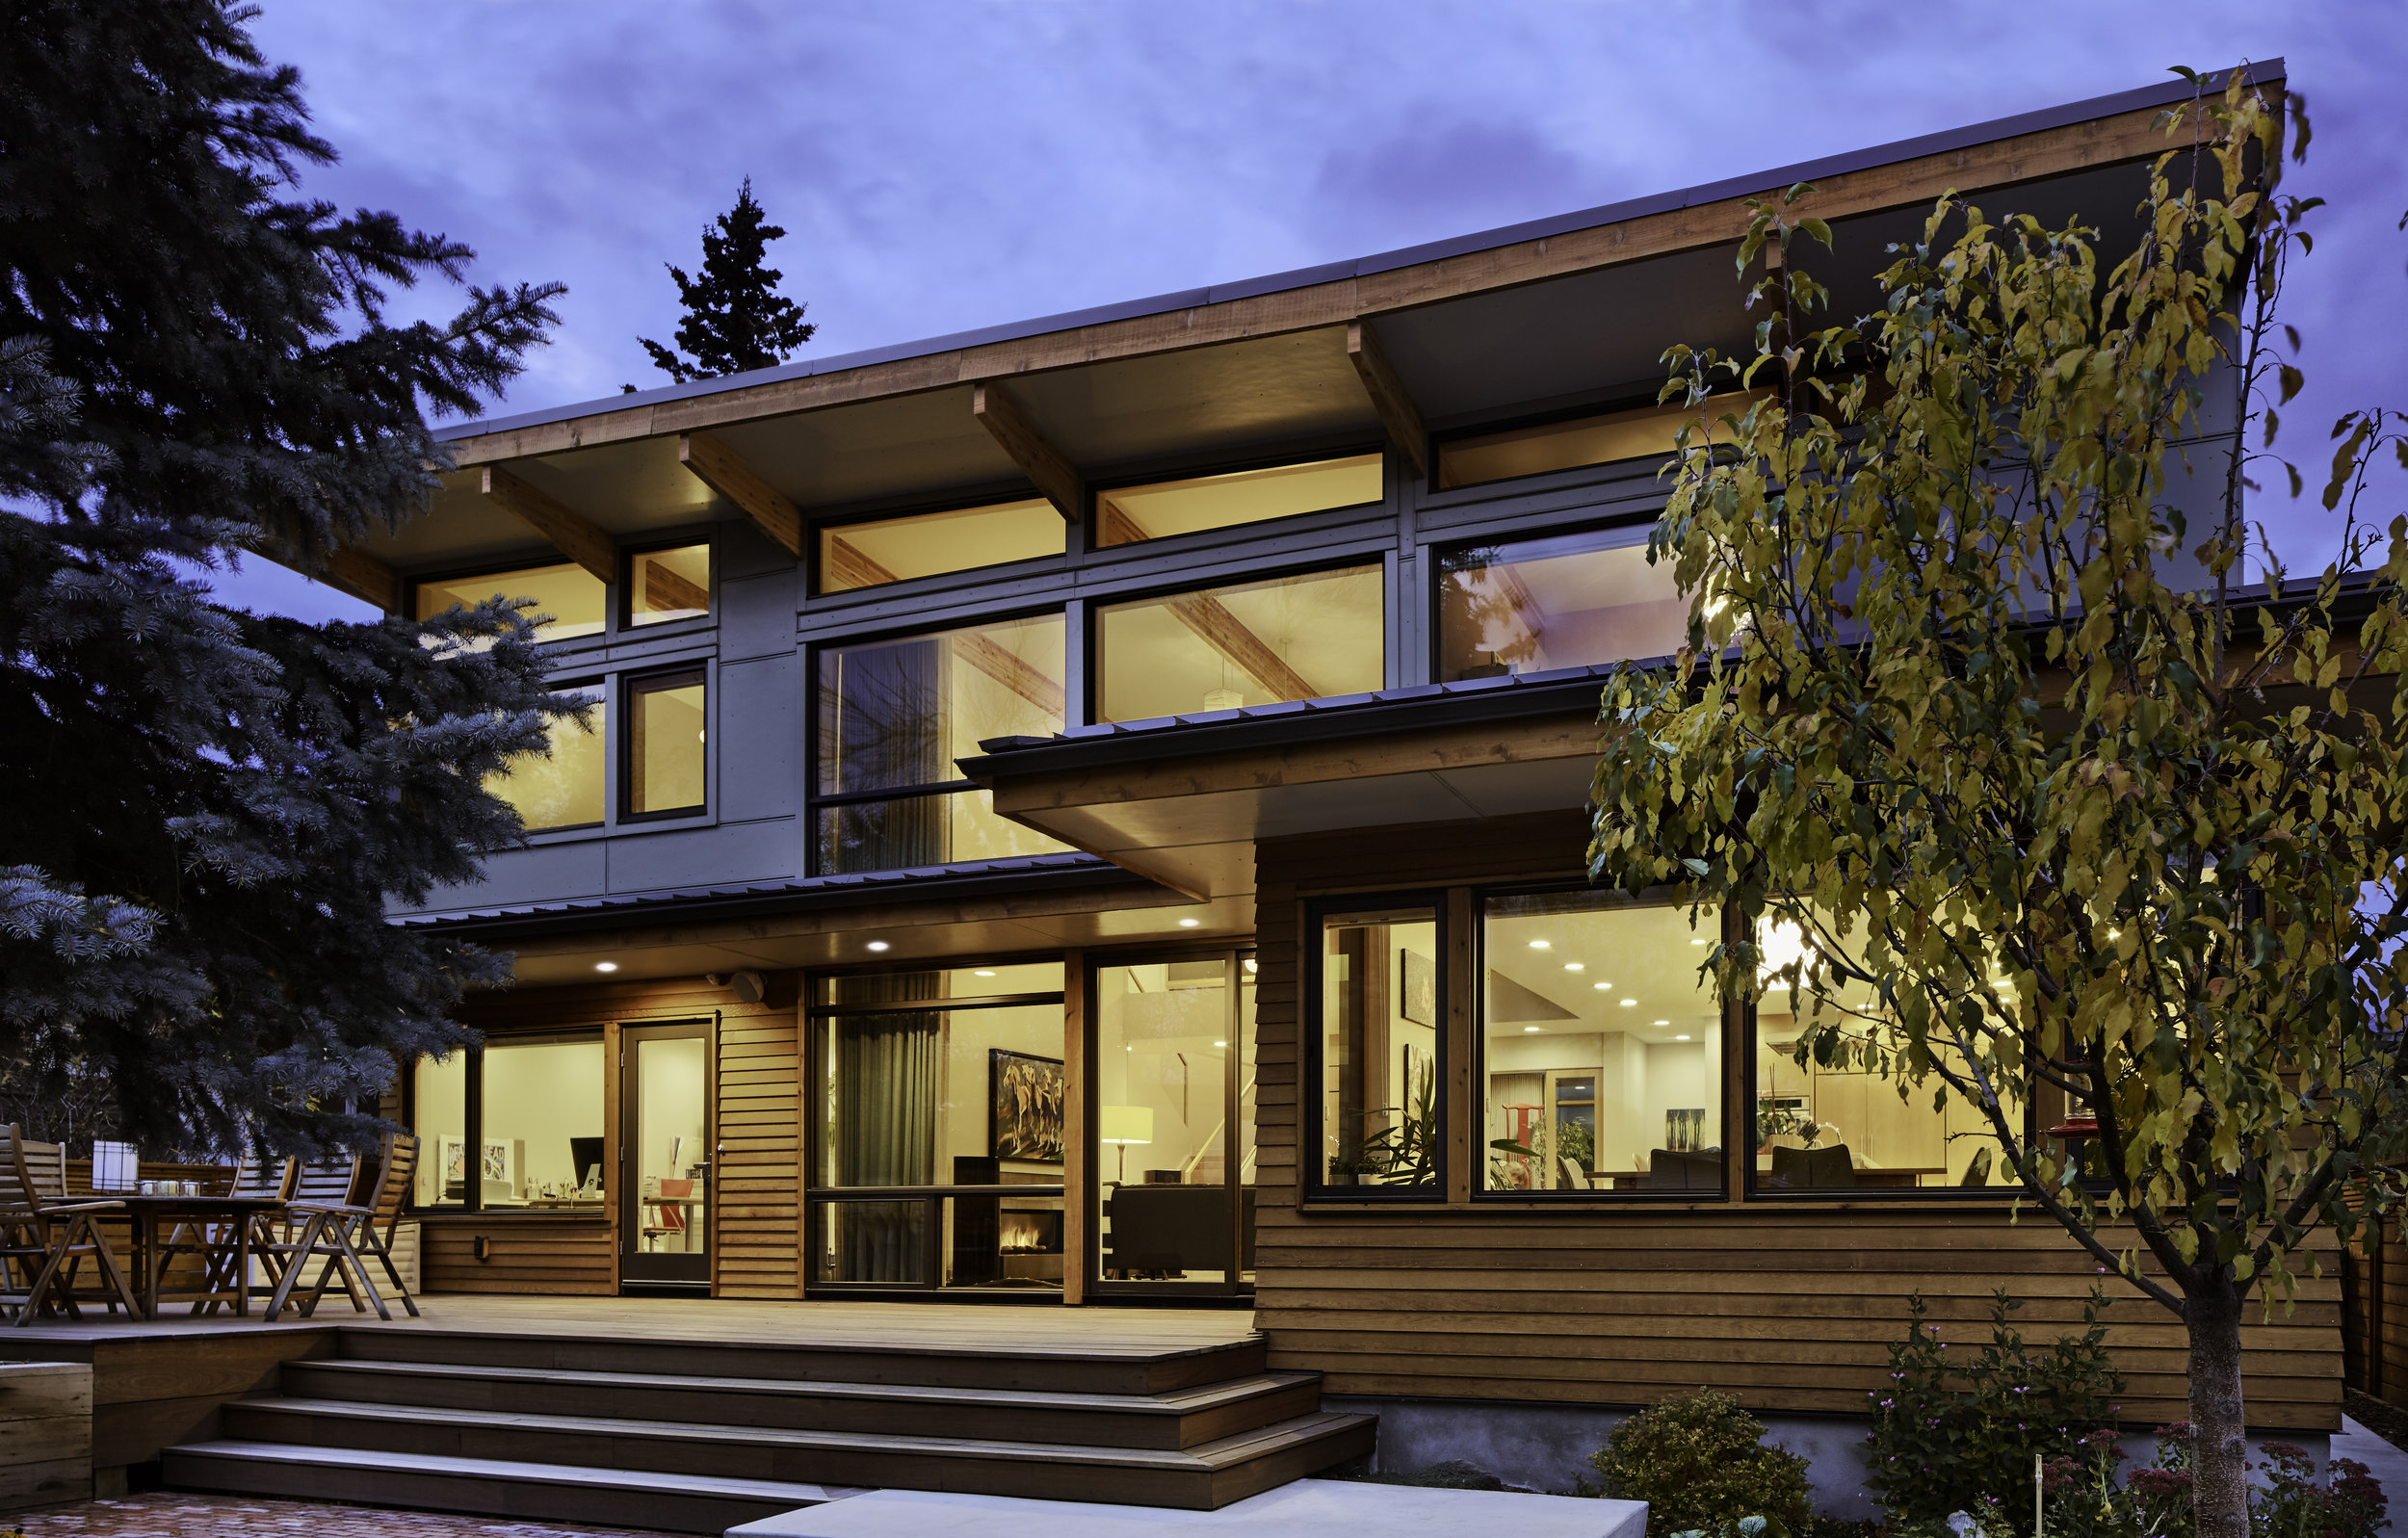 turkel_modern_design_prefab_home_mckay_calgary_facade.jpg